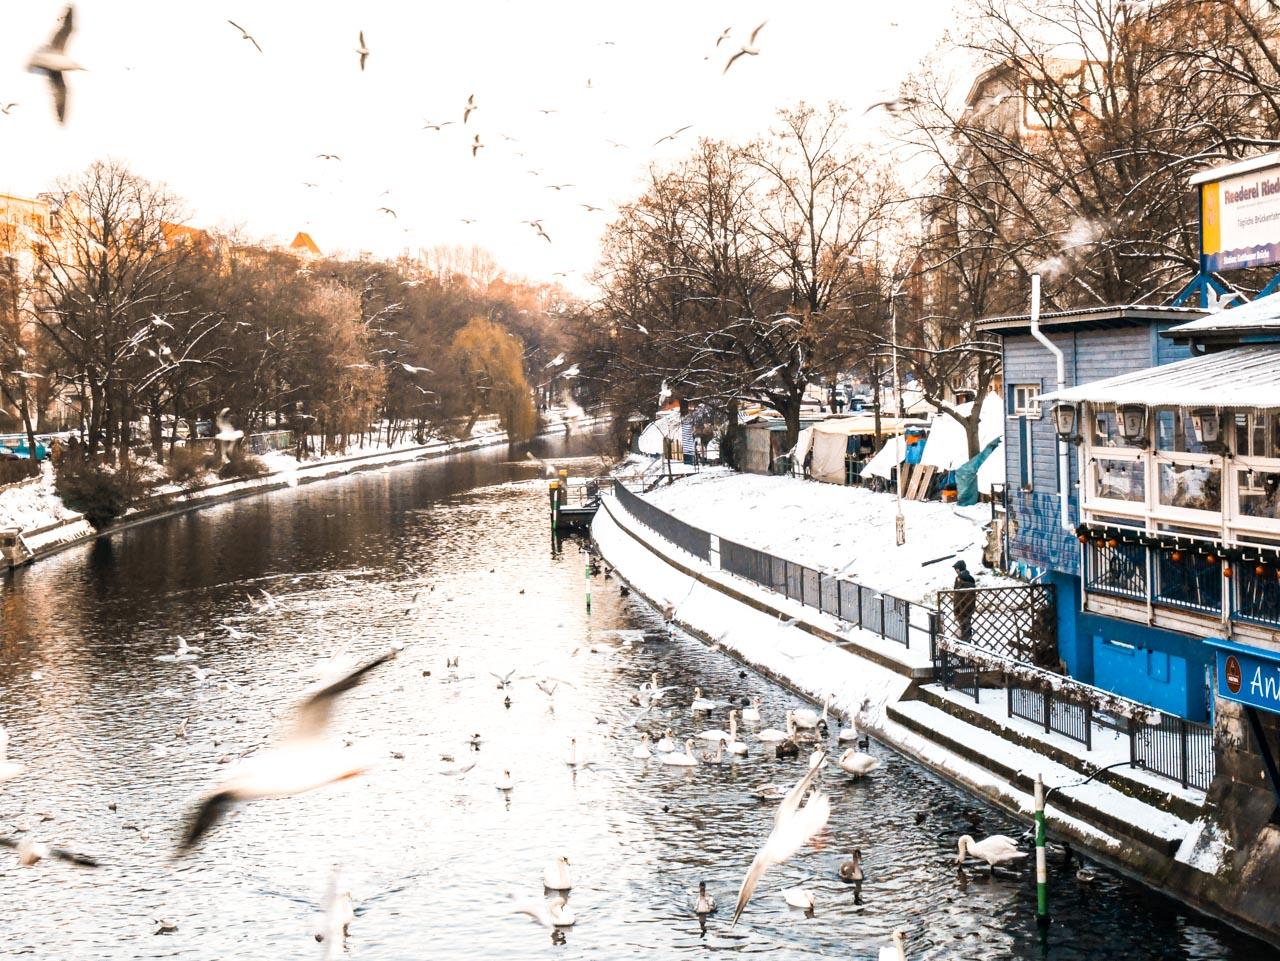 Balade le long du Lanwehrkanal à Berlin